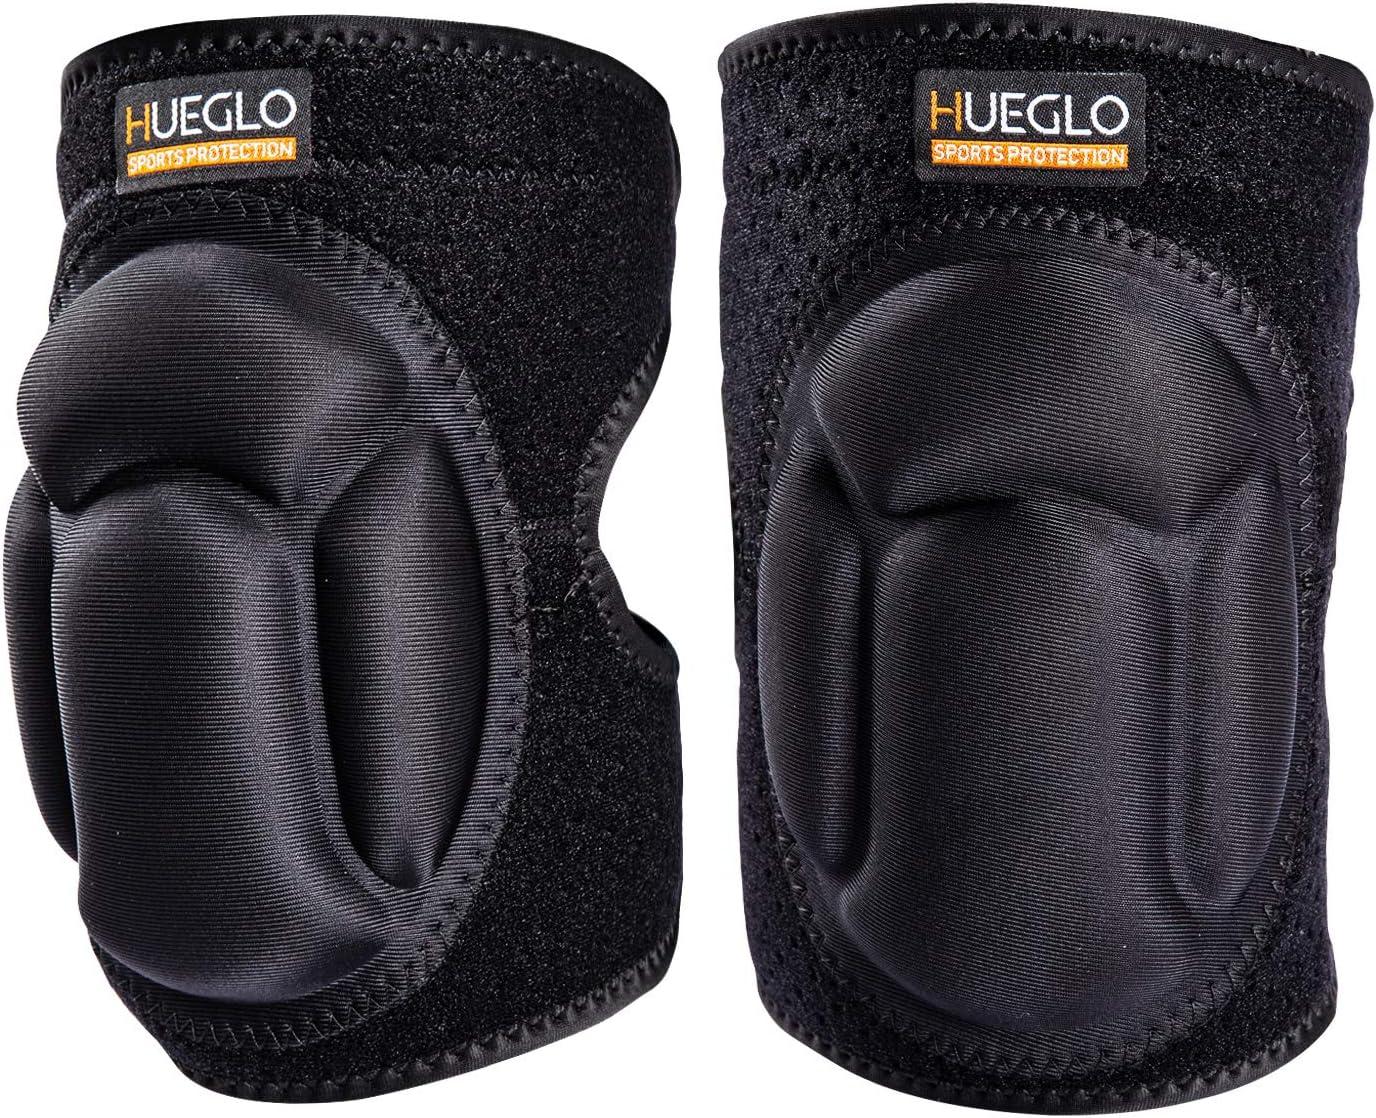 HUEGLO Adult Protective Knee Pads for Work,Knee Pads Gardening for Men & Women,Thick Sponge Anti-Slip, Collision Avoidance Dance Knee Sleeve